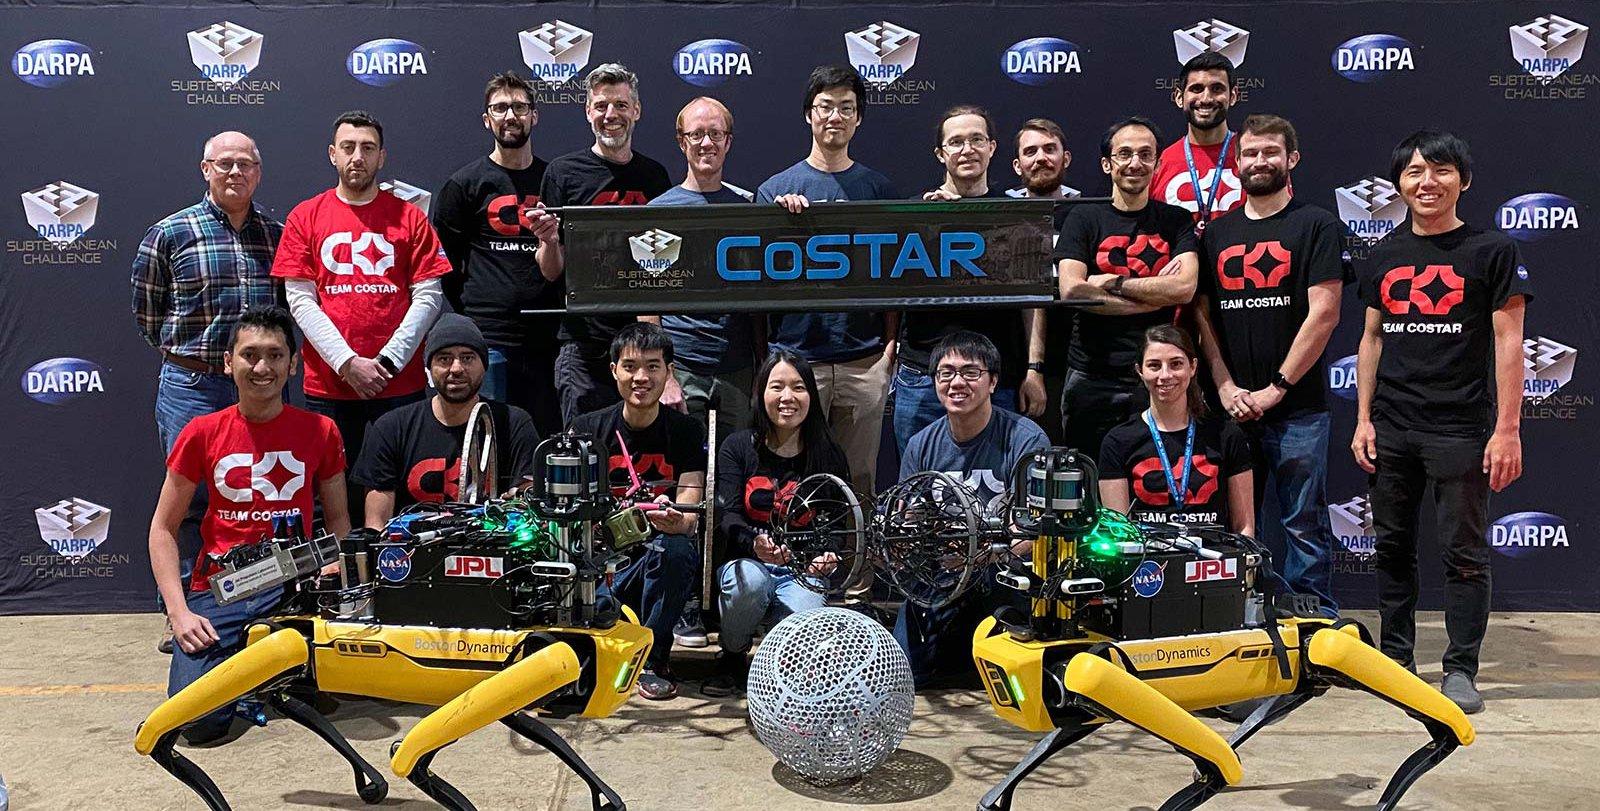 Team CoSTAR